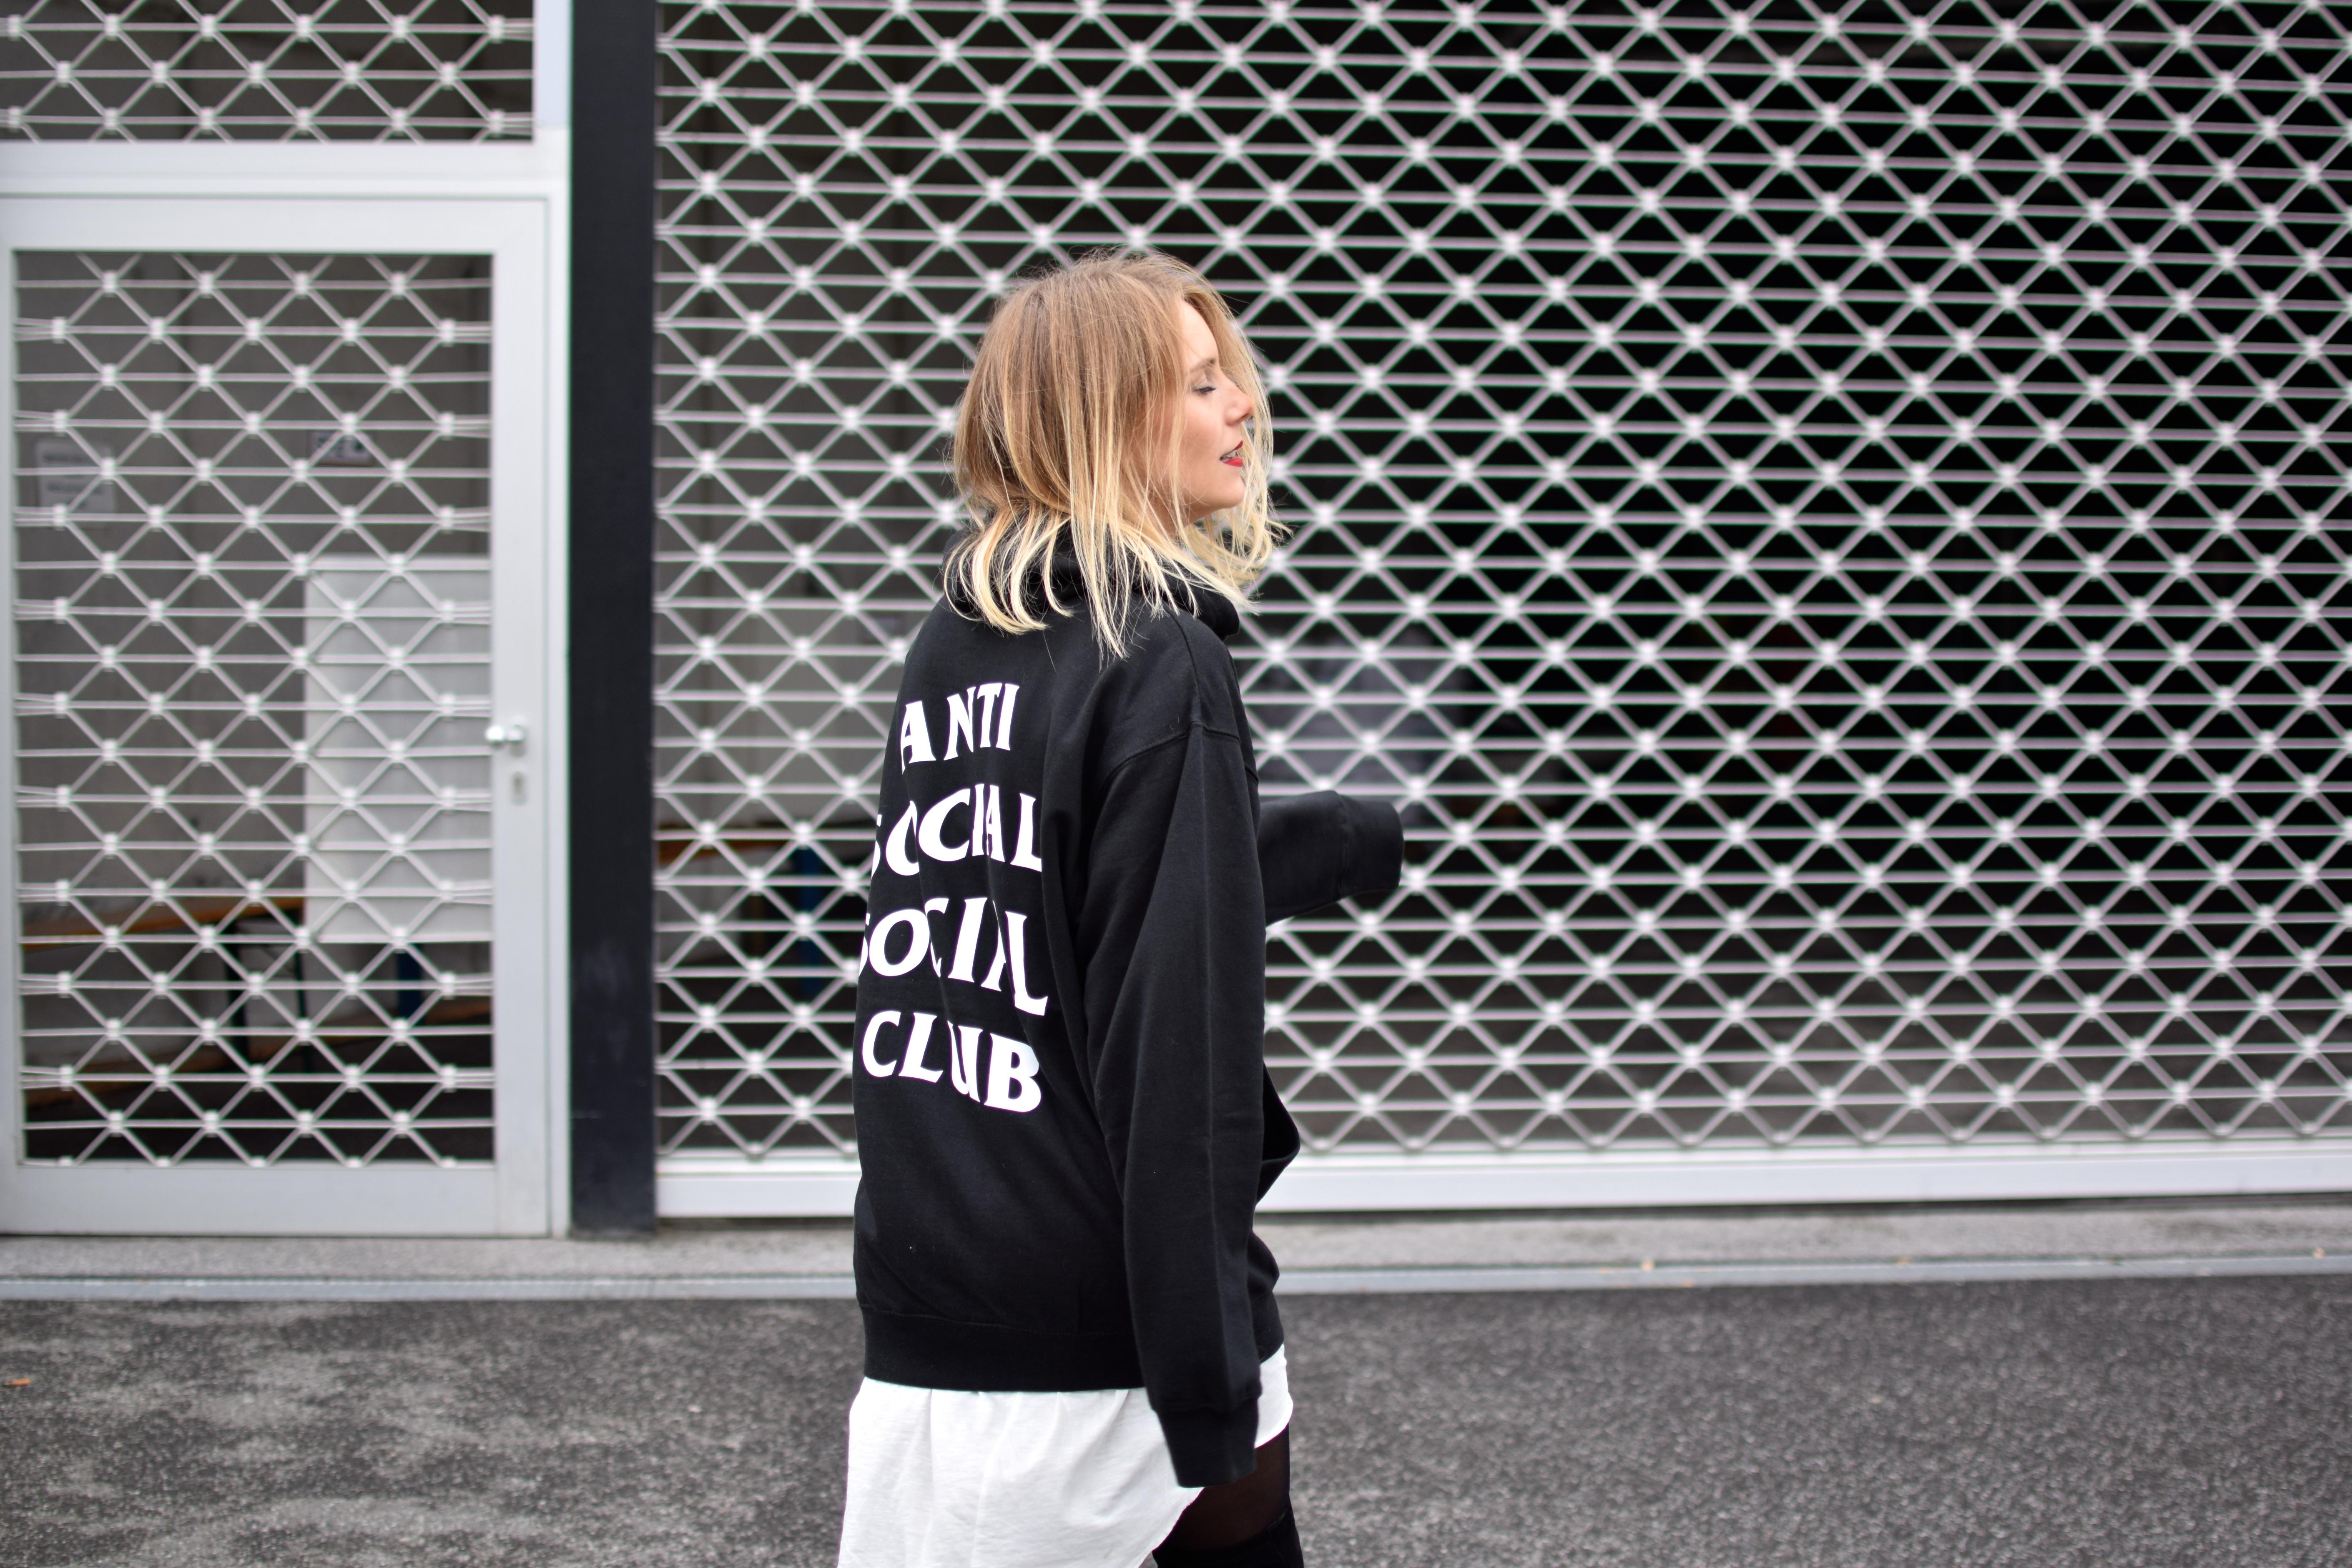 Anti Social Club Sweater - Shoppisticated 6cb175eeda